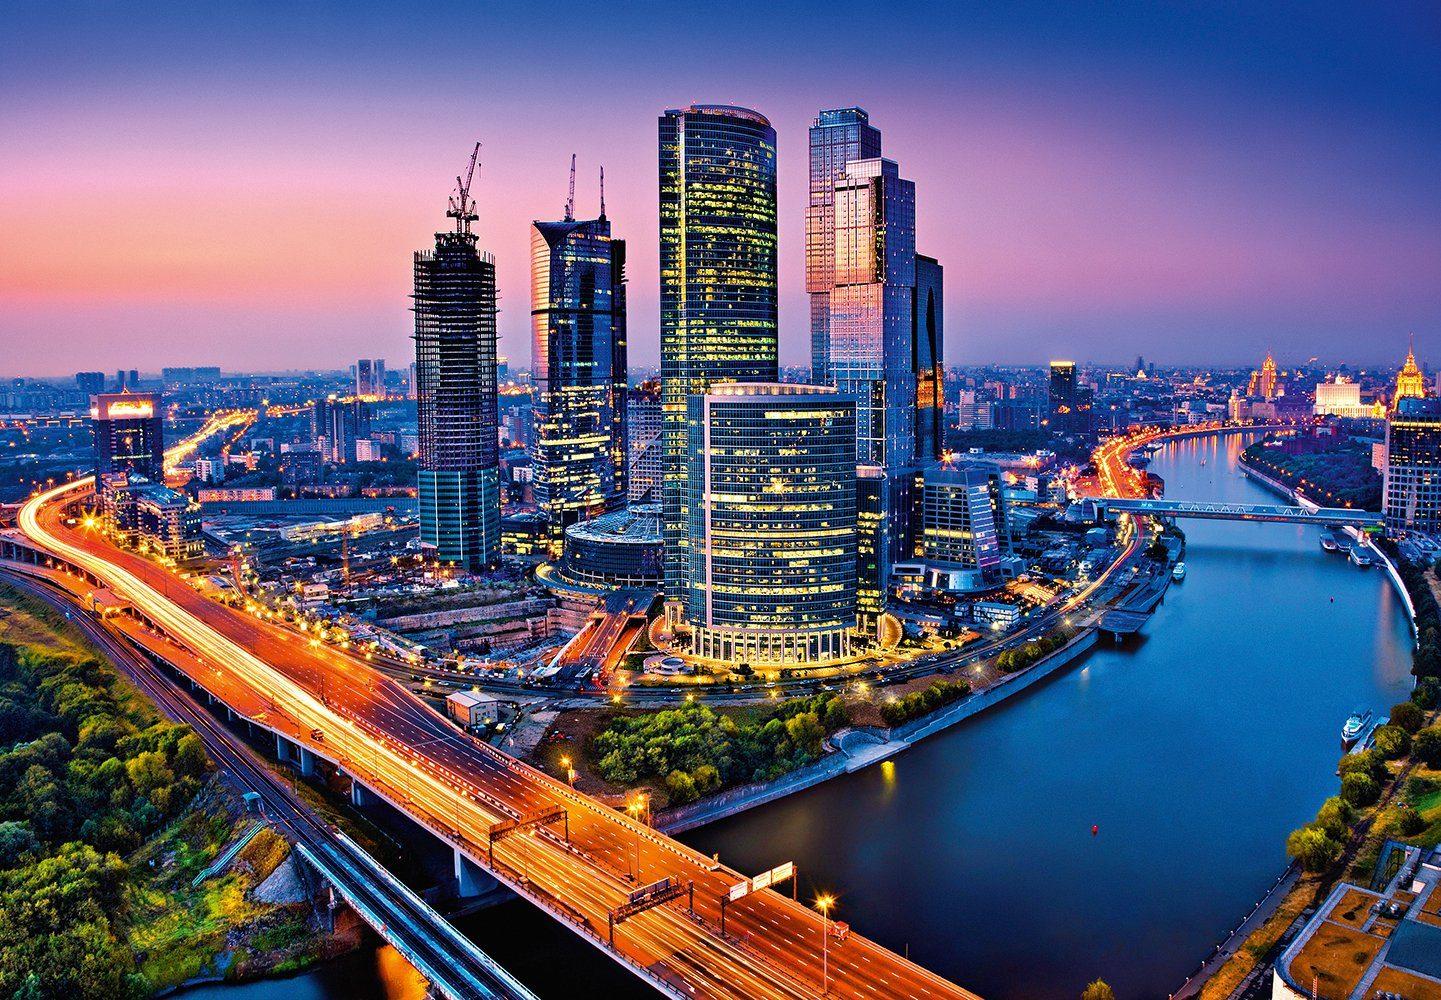 Fototapete »Moscow Twilight«, 8-teilig, 366x254 cm